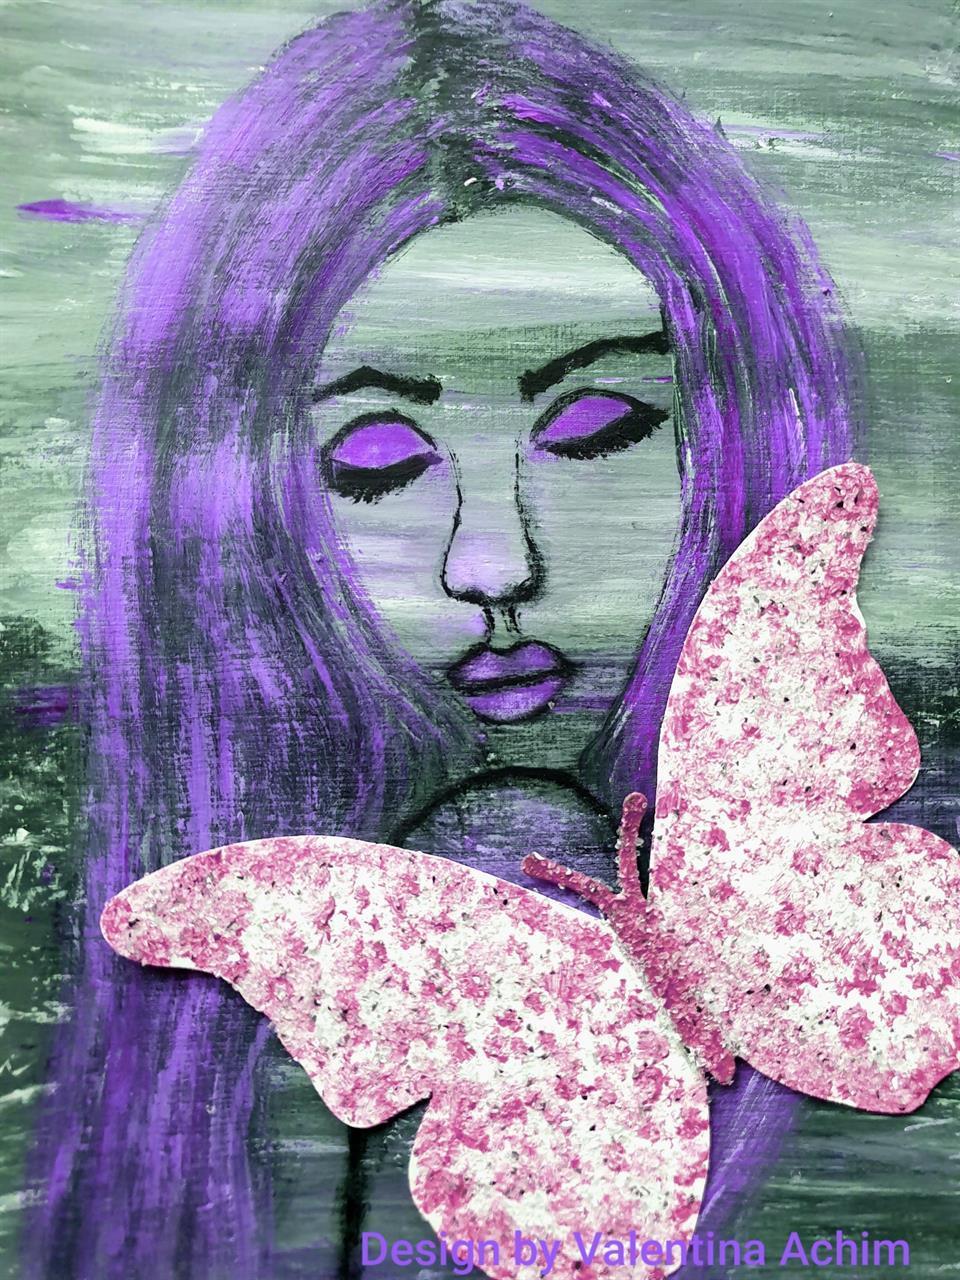 Fotoposters  30x40 cm, lila